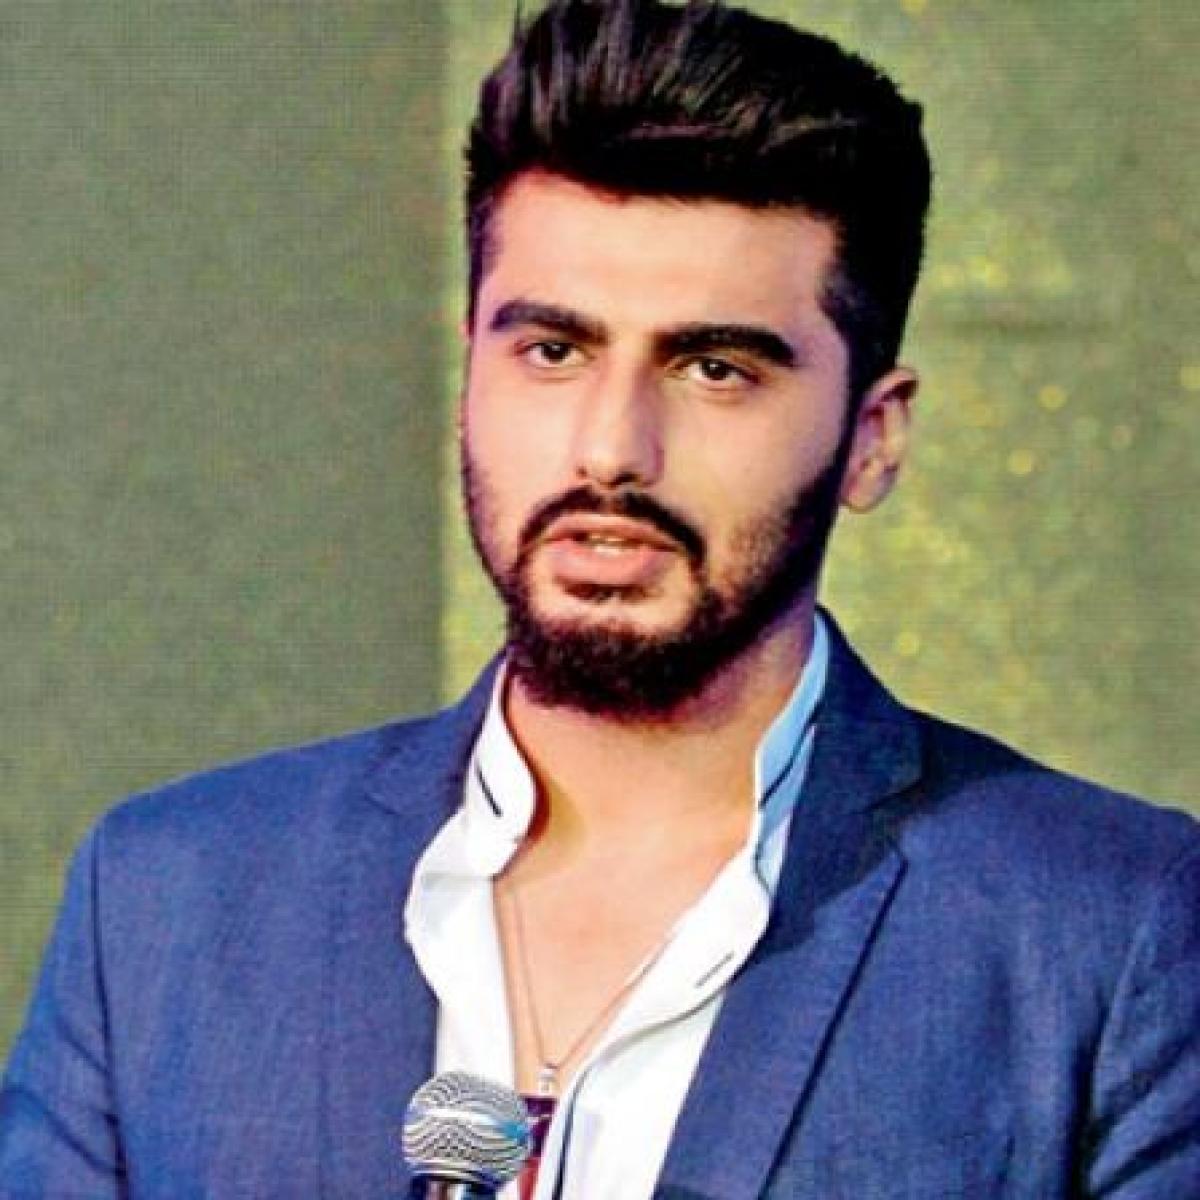 Arjun Kapoor tags Virat Kohli on funny video showing 'cricket during quarantine'